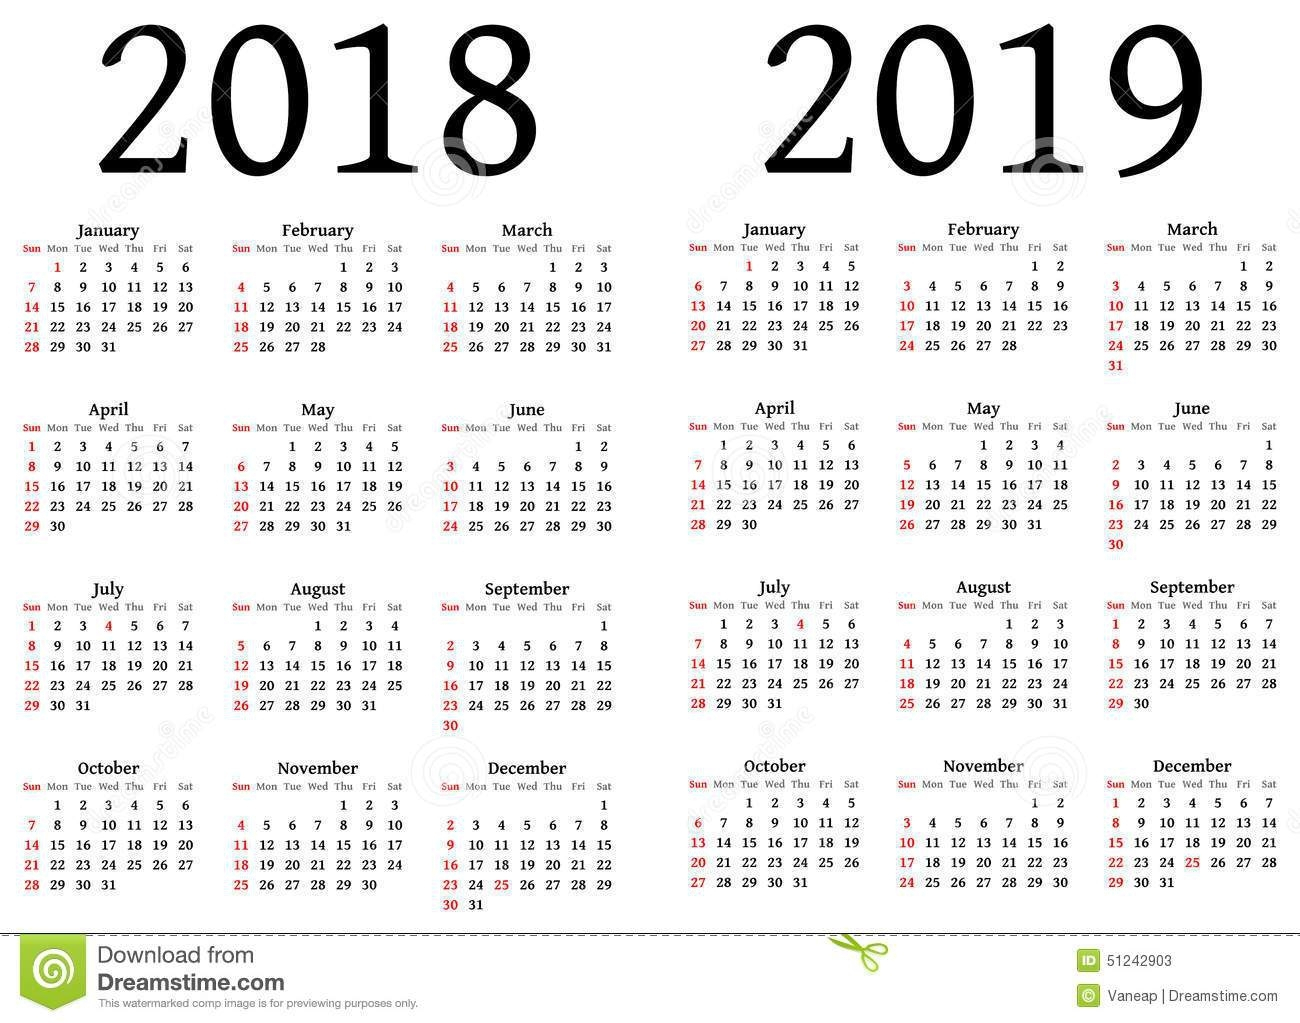 Julian Calendar – Printable Year Calendar within Julian Calendar 2018